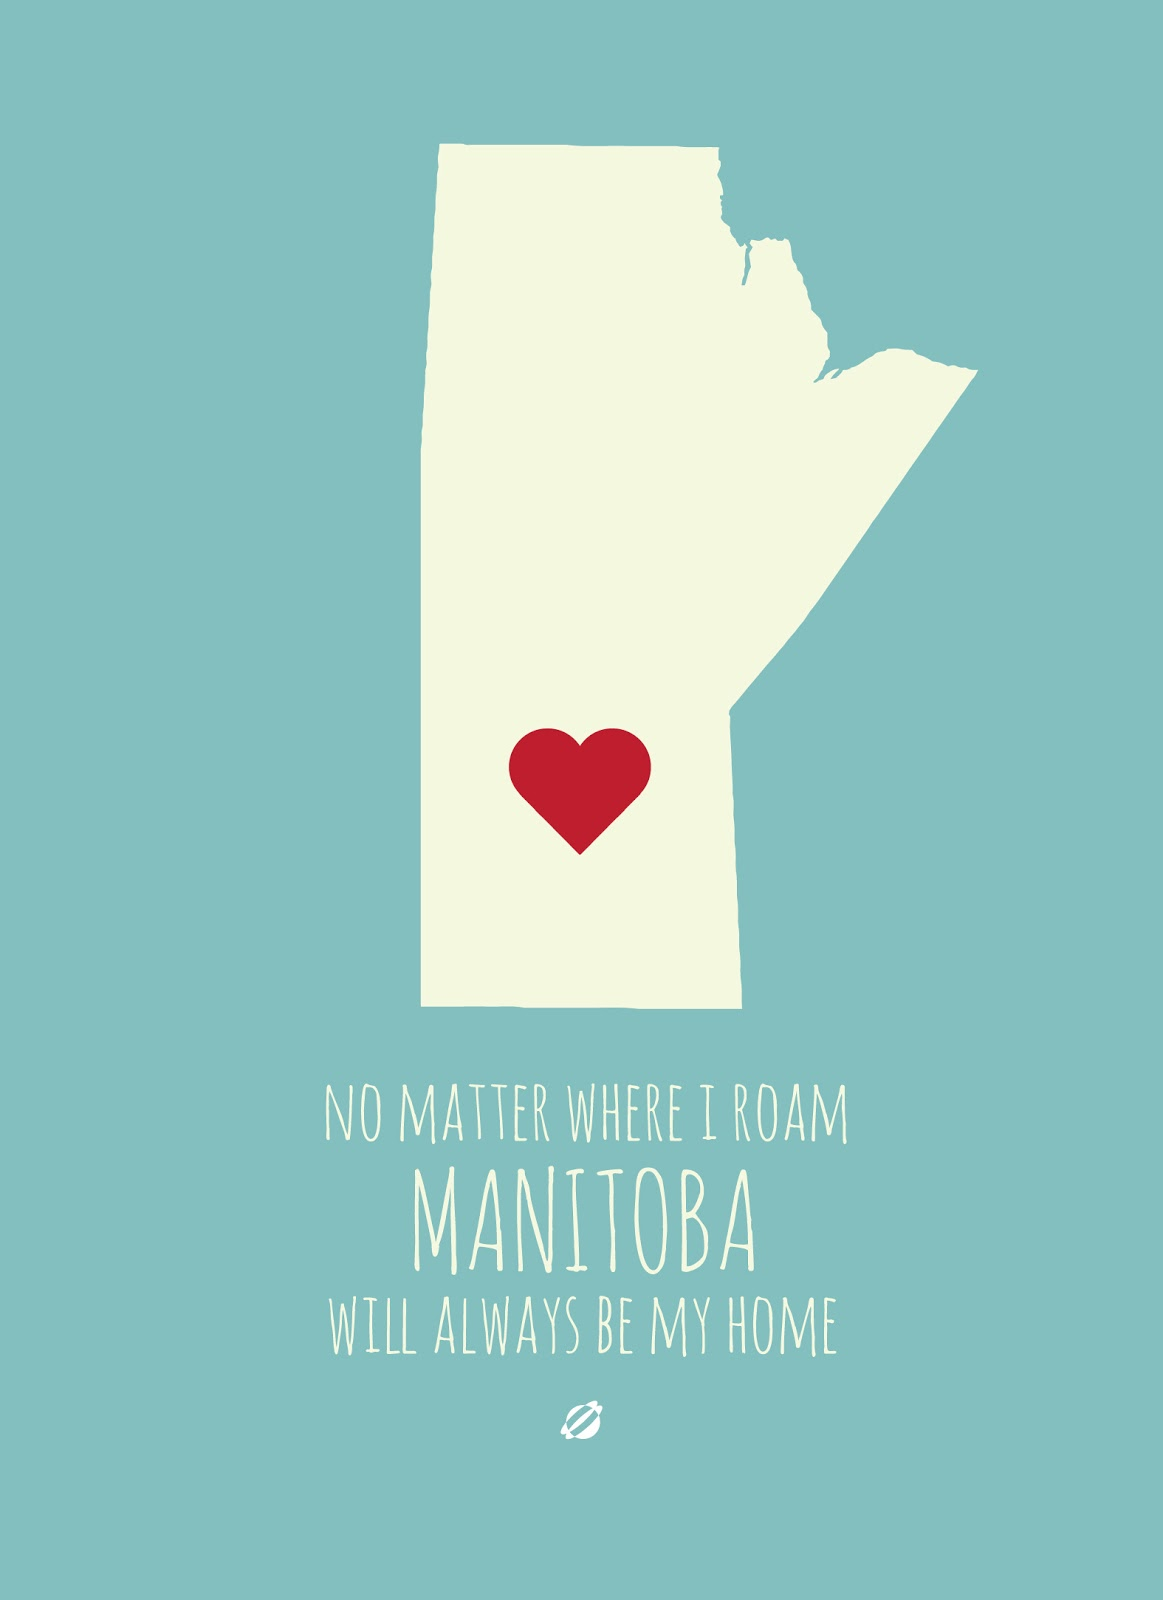 LostBumblebee 2013 Manitoba